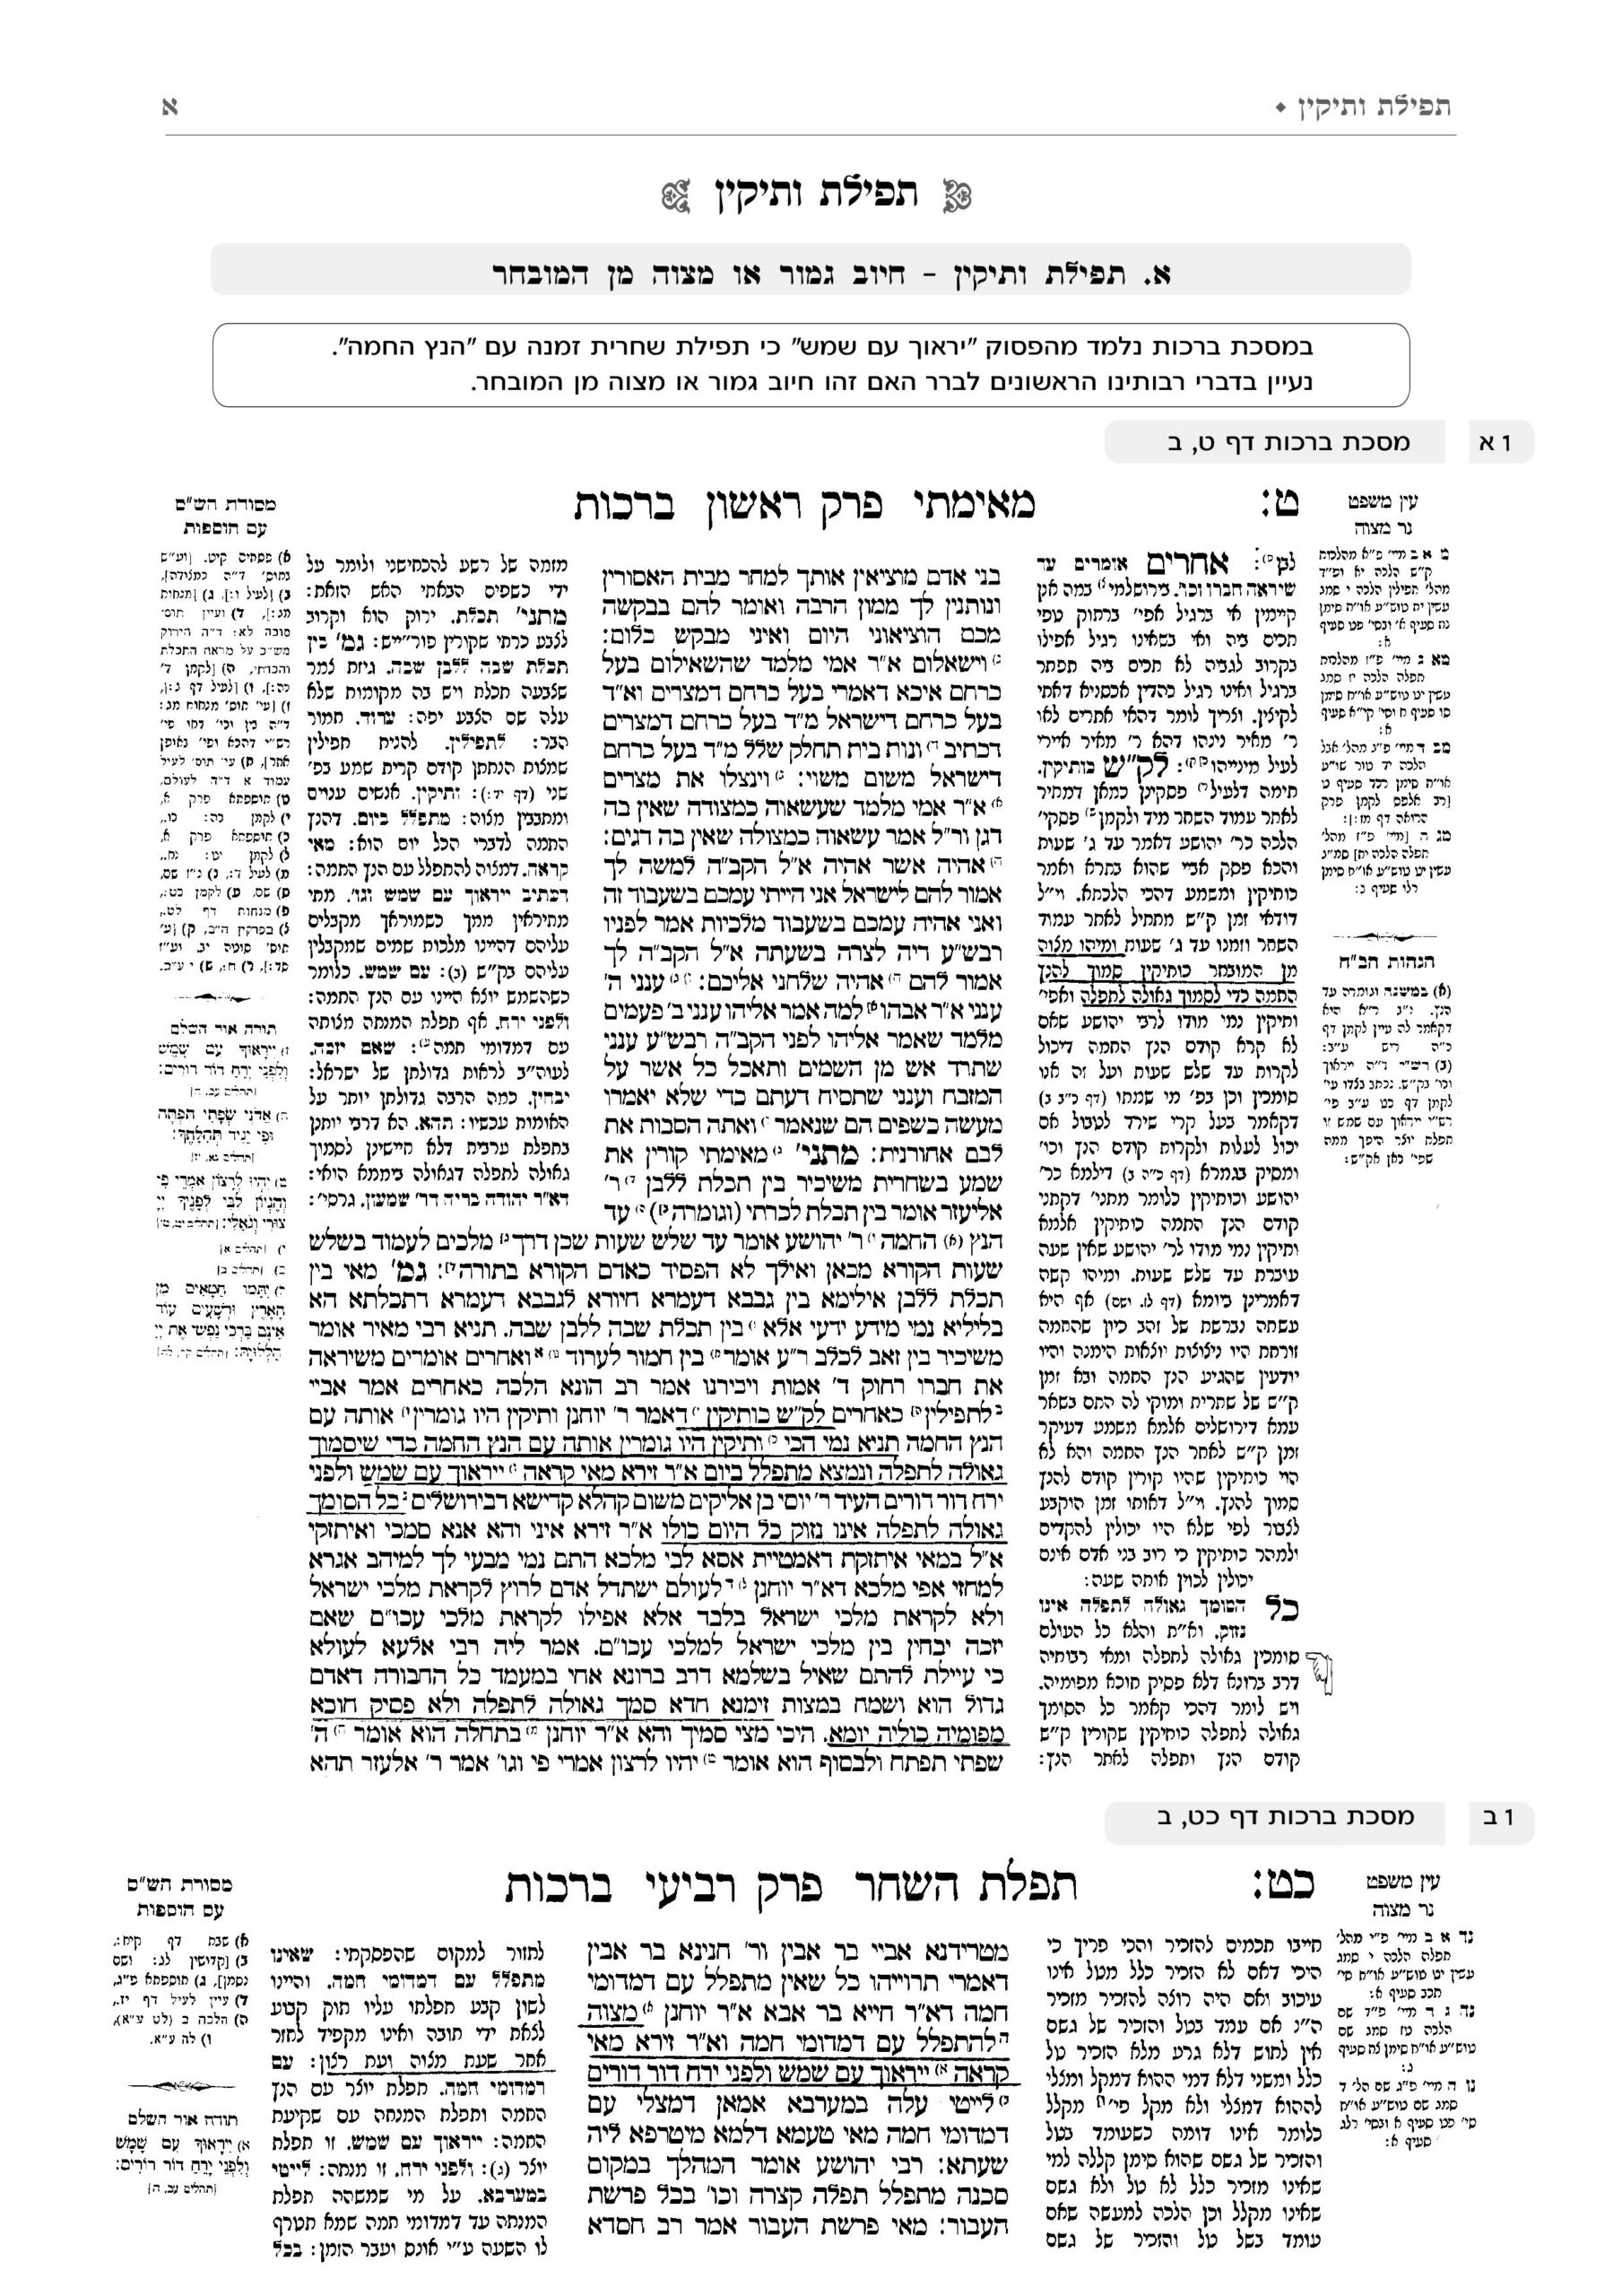 7.13.20-GottesmanTeleconference17-post-1